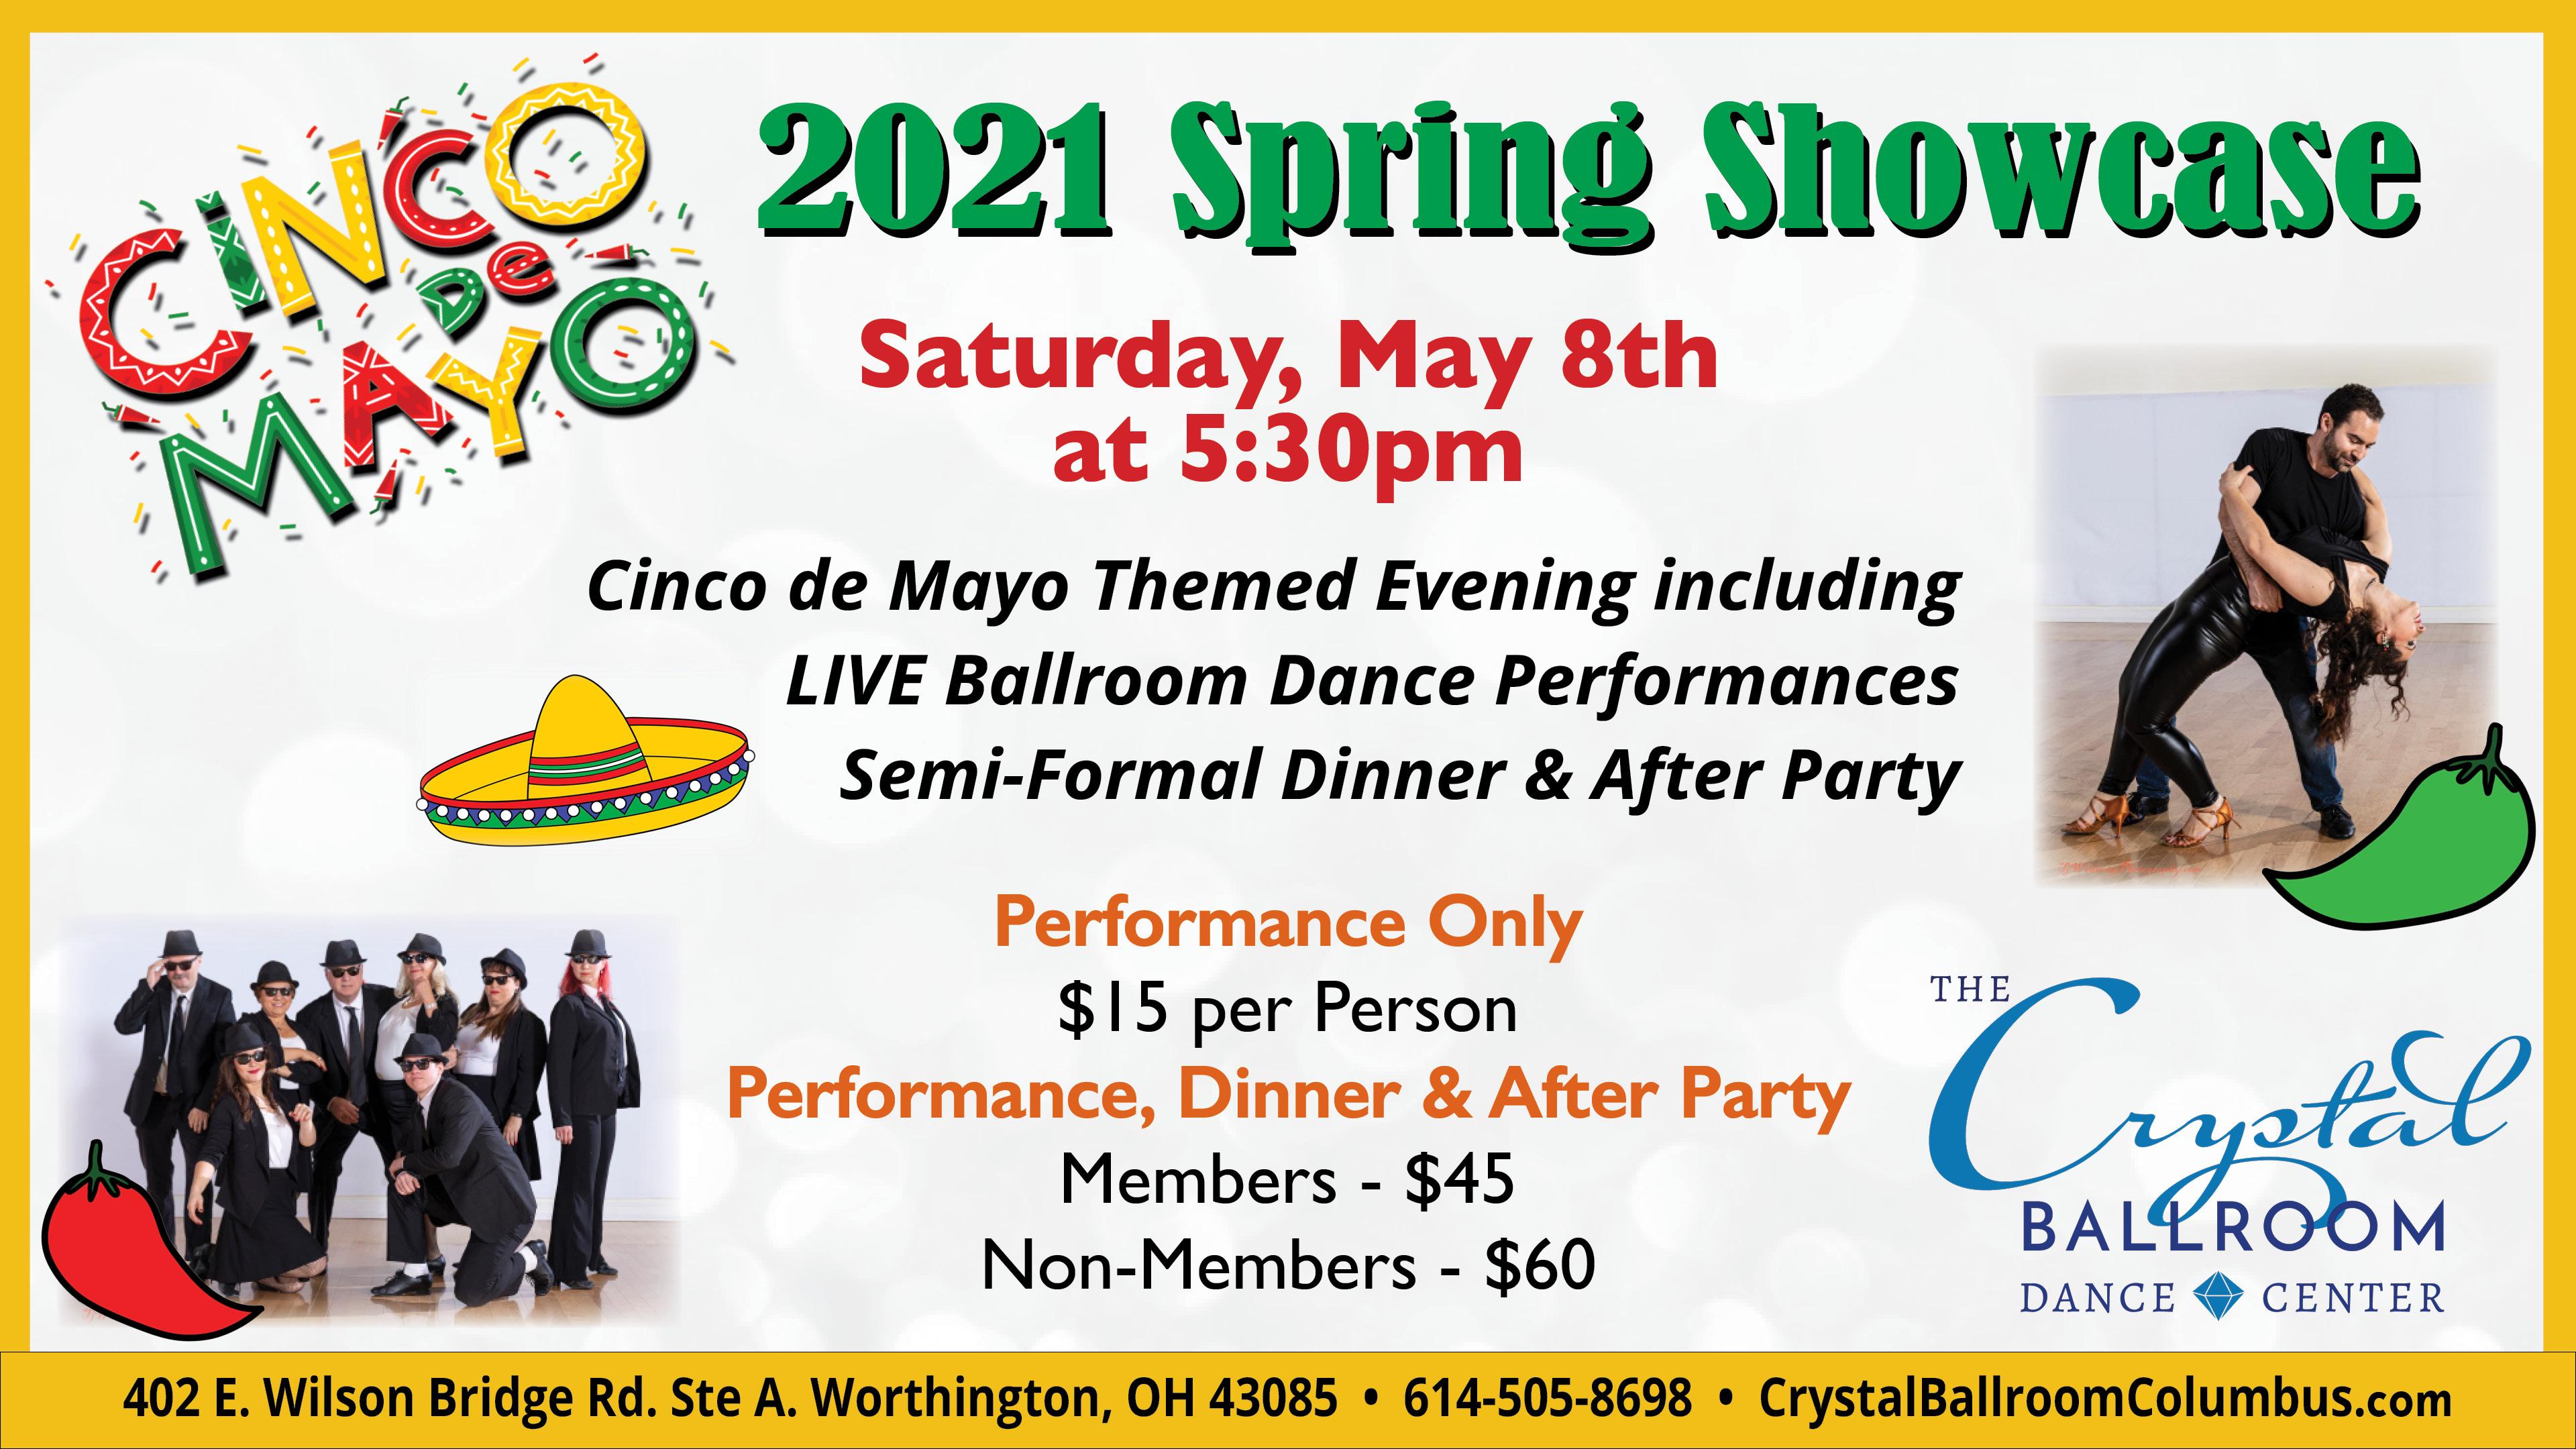 2021 Spring Showcase: Cinco de Mayo